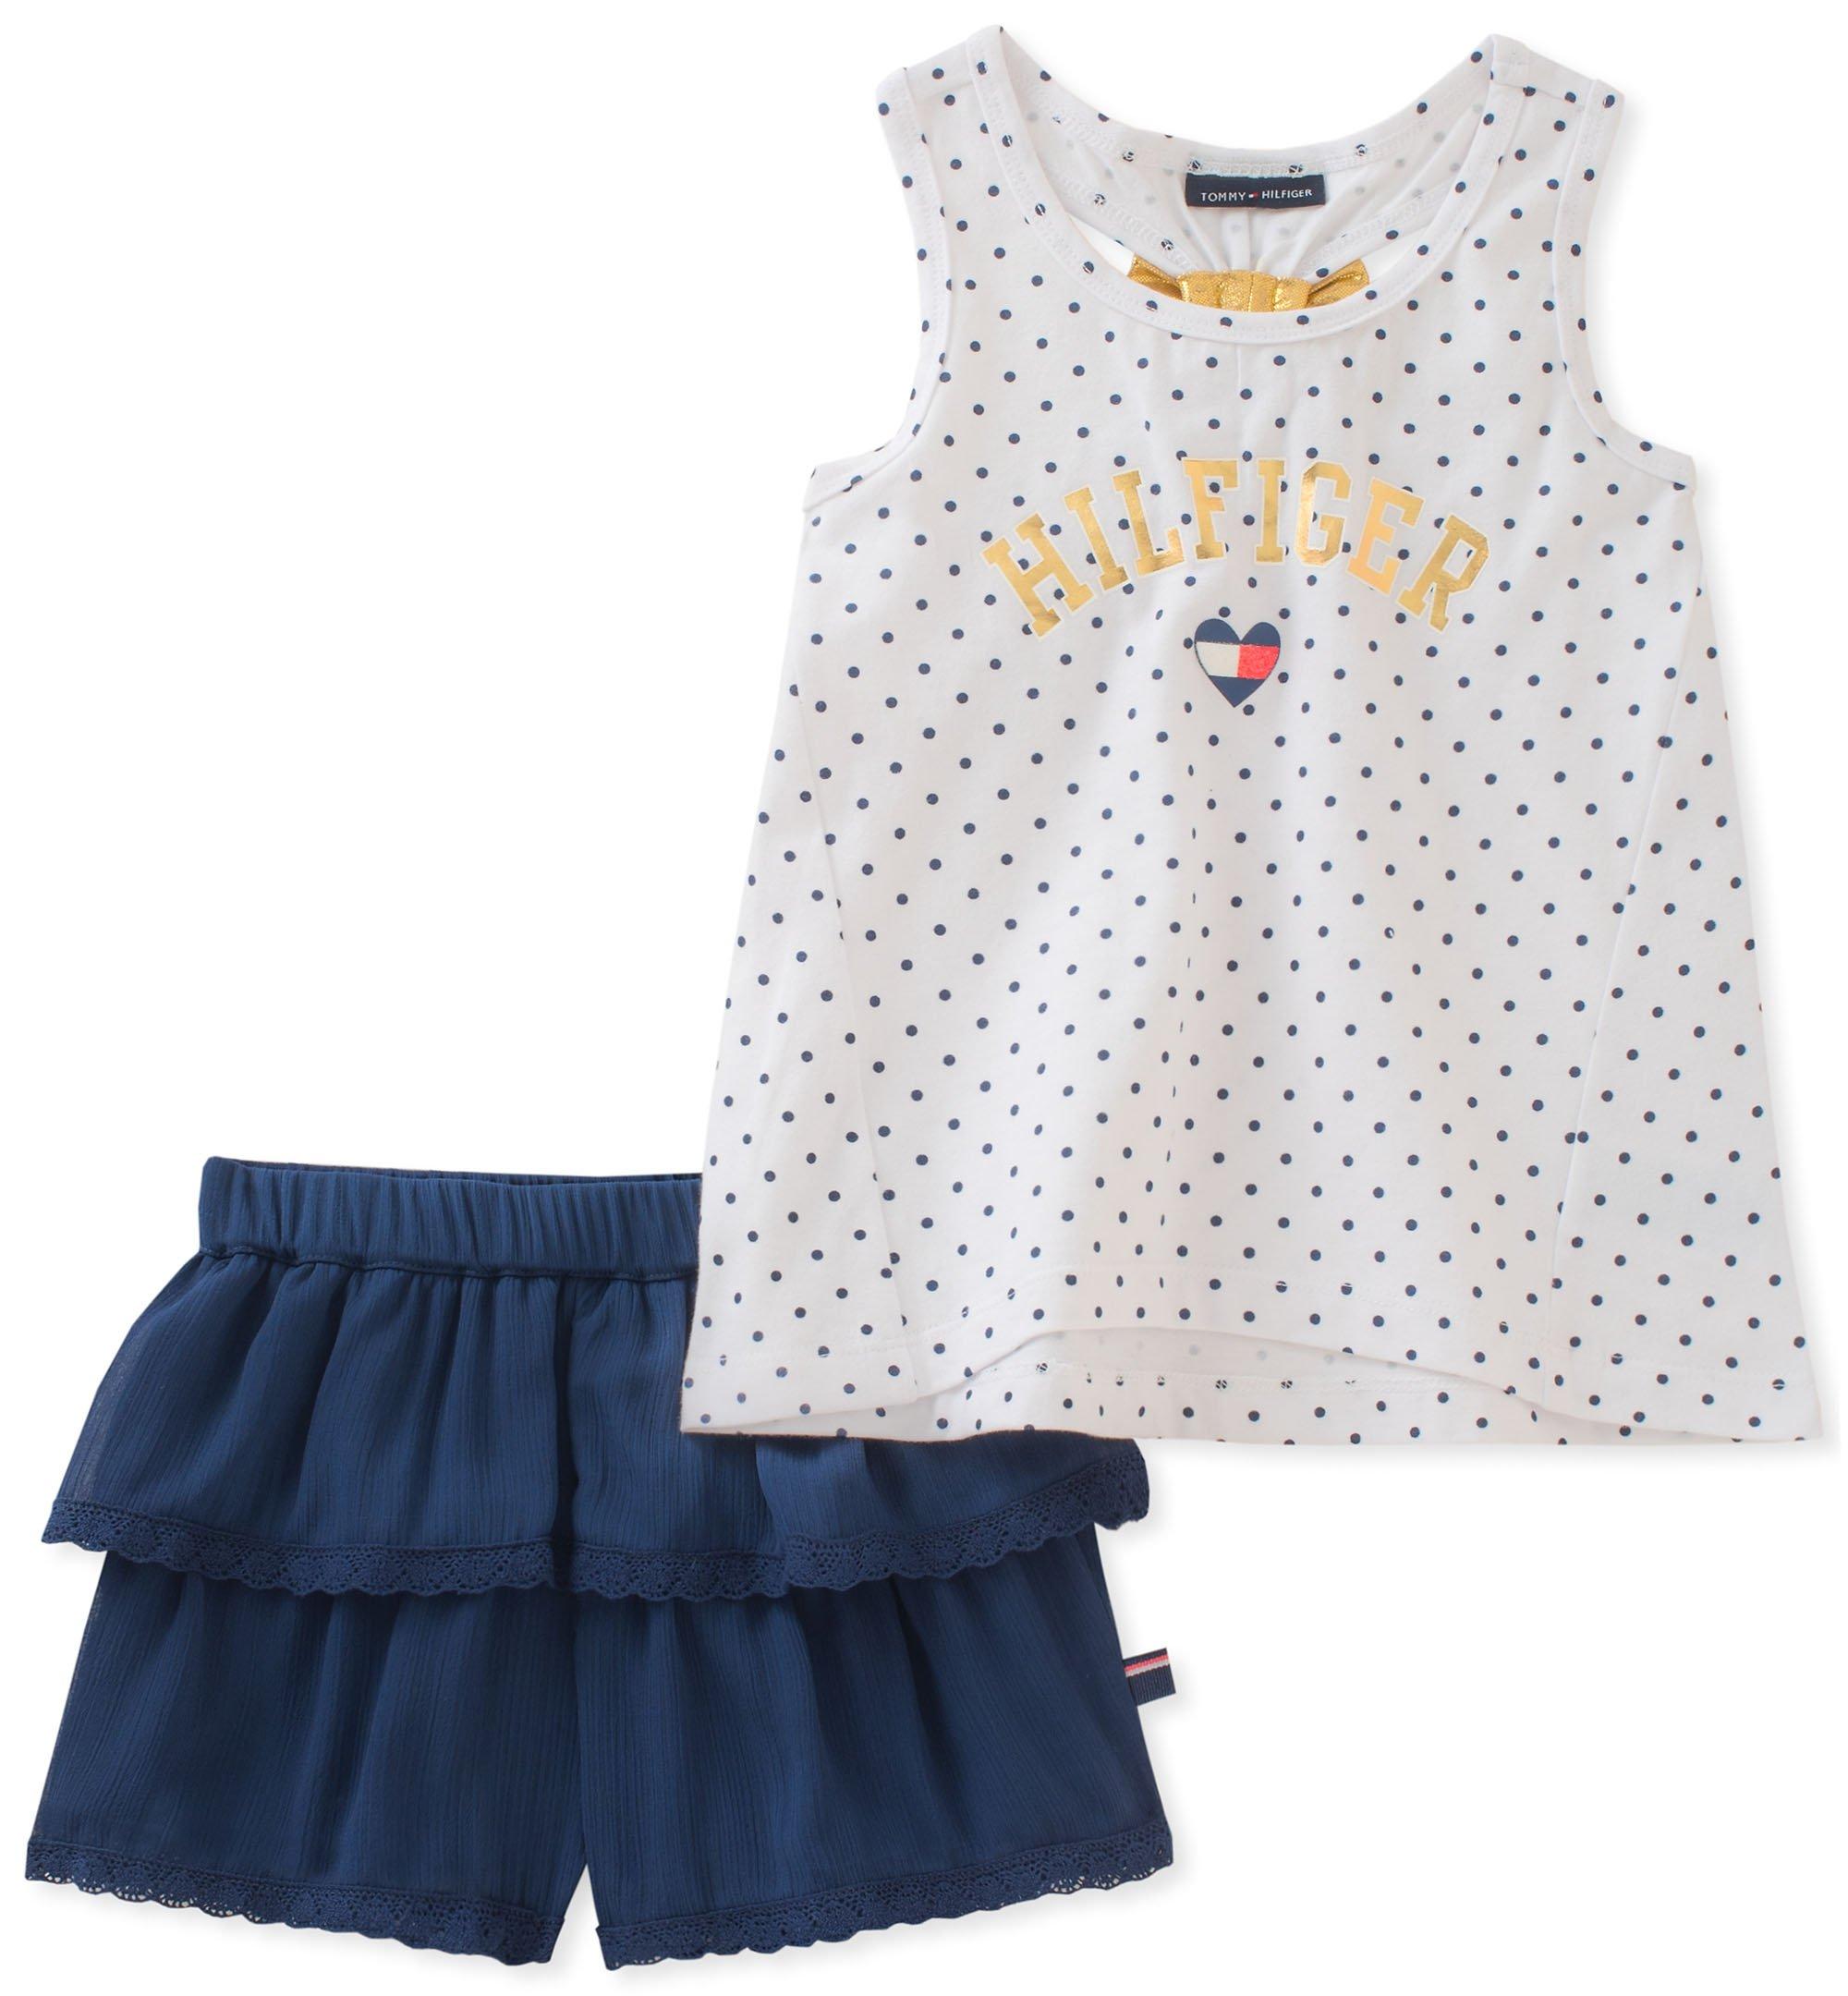 Tommy Hilfiger Little Girls' Shorts Set, White/Navy, 6X